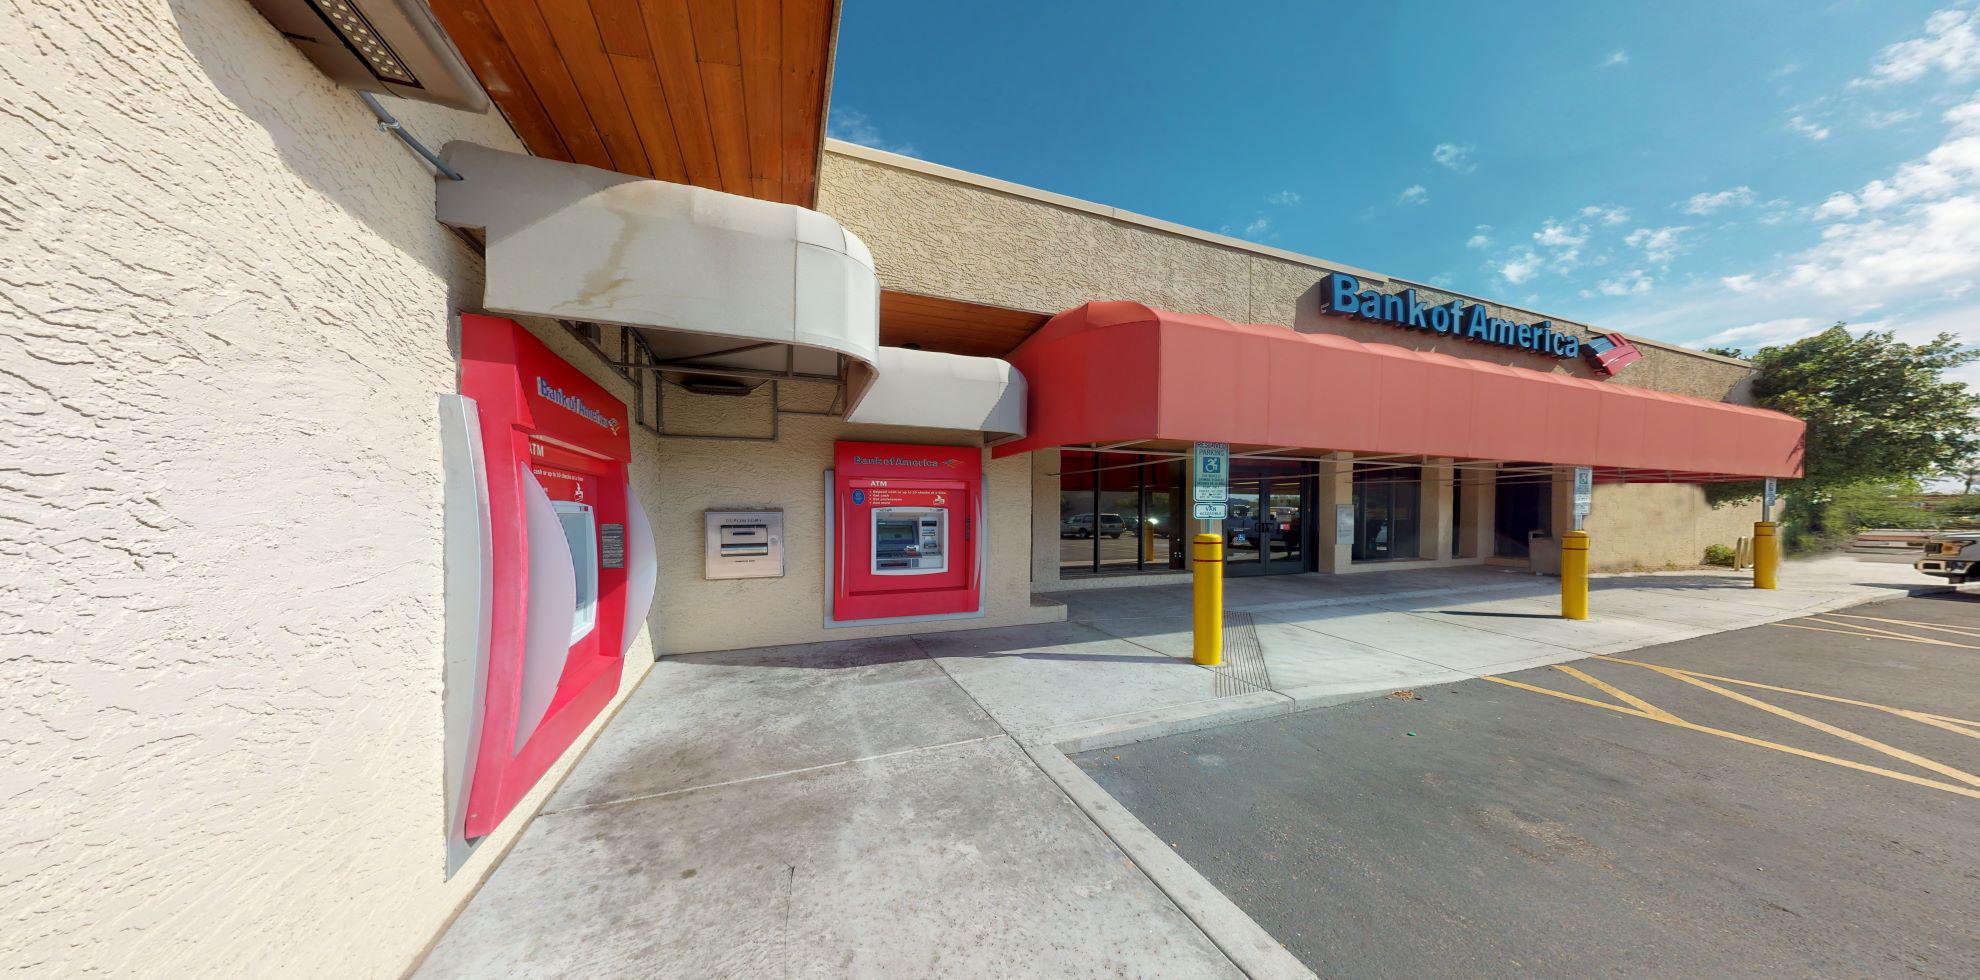 Bank of America financial center with drive-thru ATM | 13008 N Tatum Blvd, Phoenix, AZ 85032